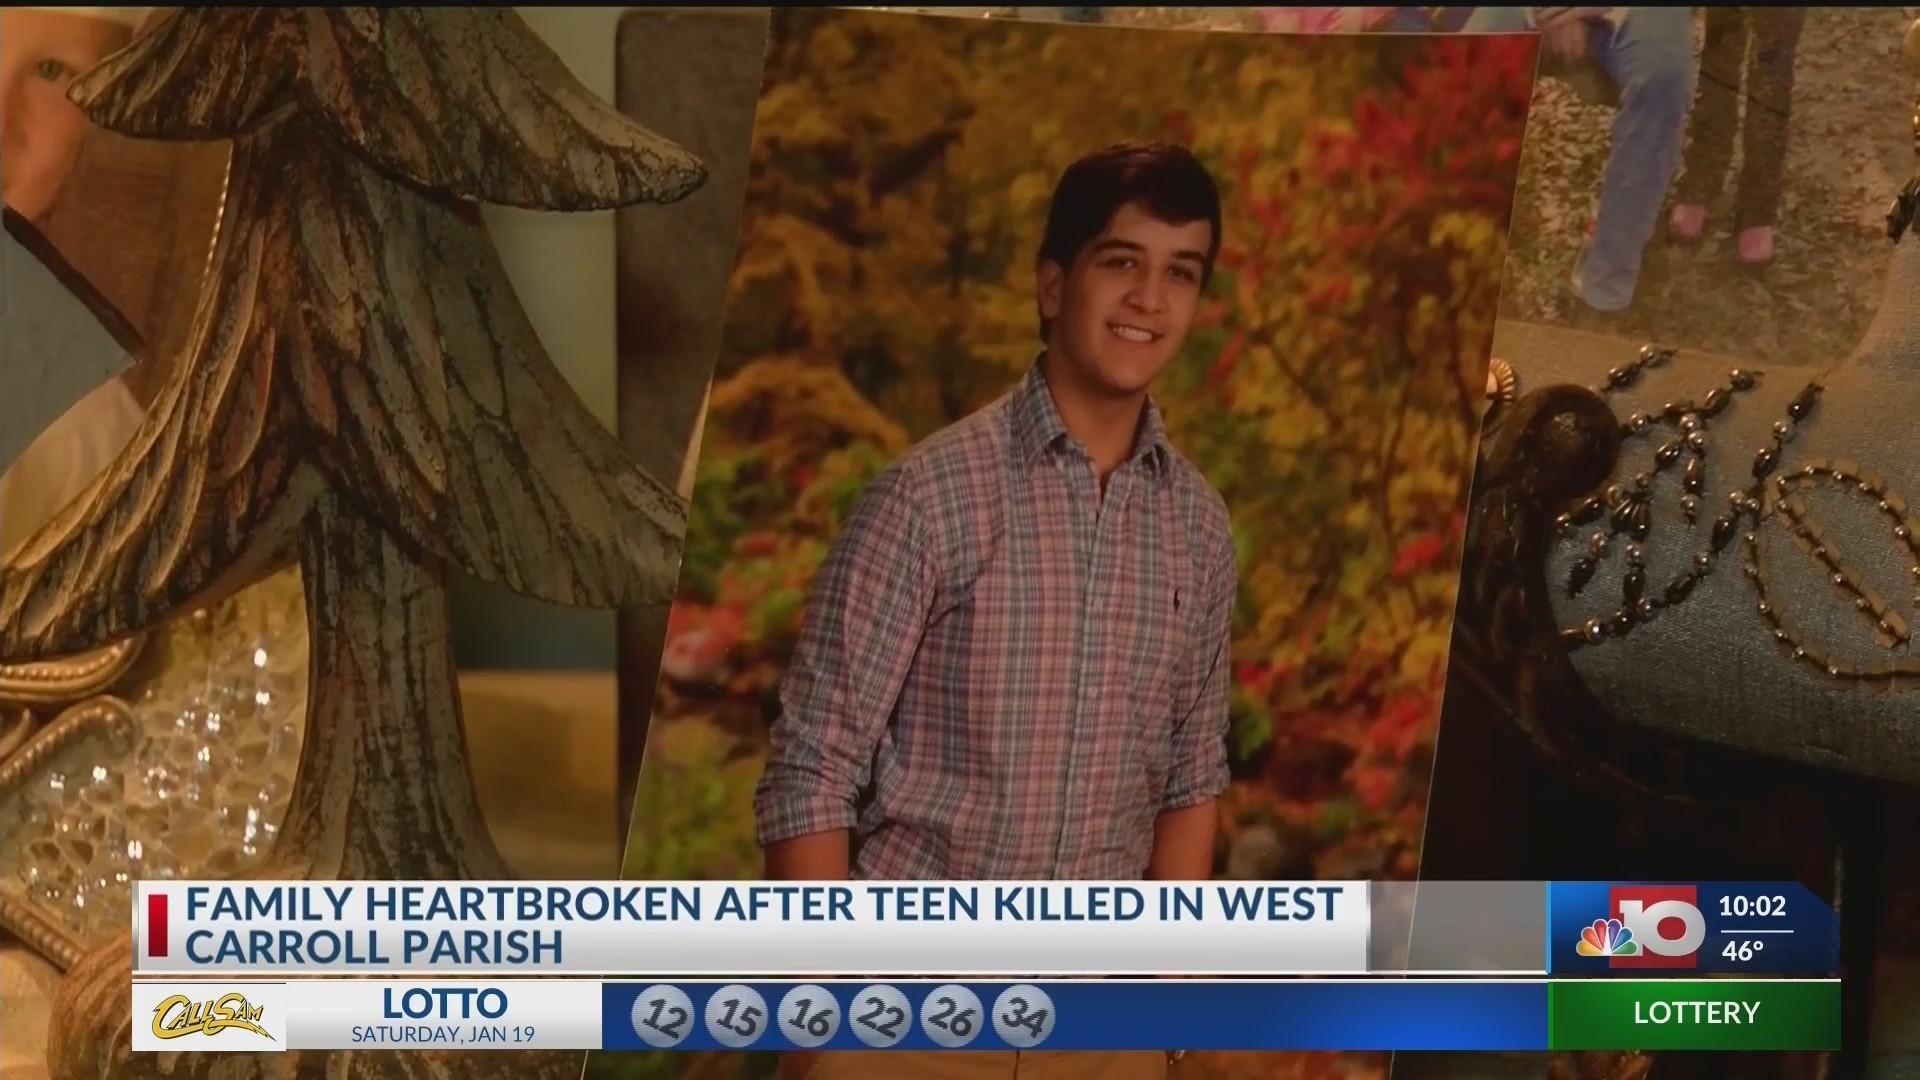 Family heartbroken after teen killed in West Carroll Parish